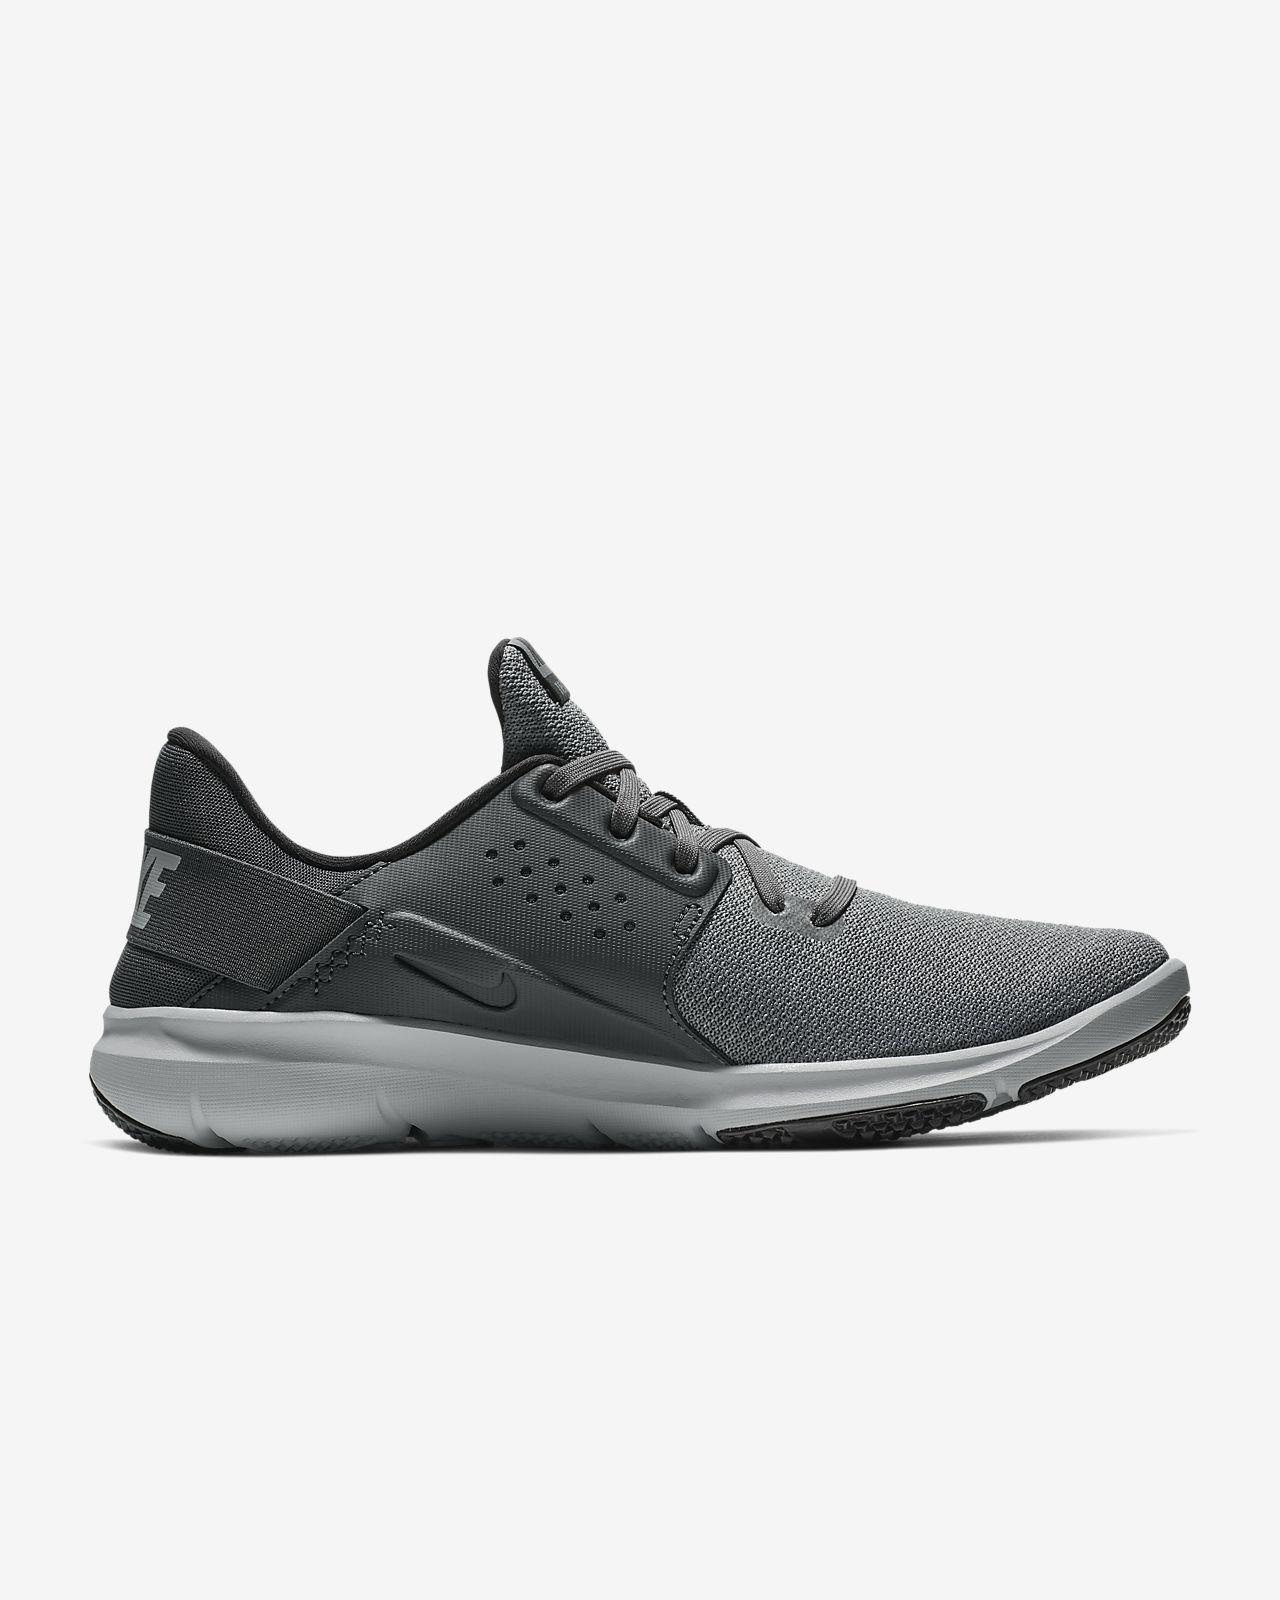 63c5b7bce509 Nike Flex Control 3 Men s Training Shoe. Nike.com